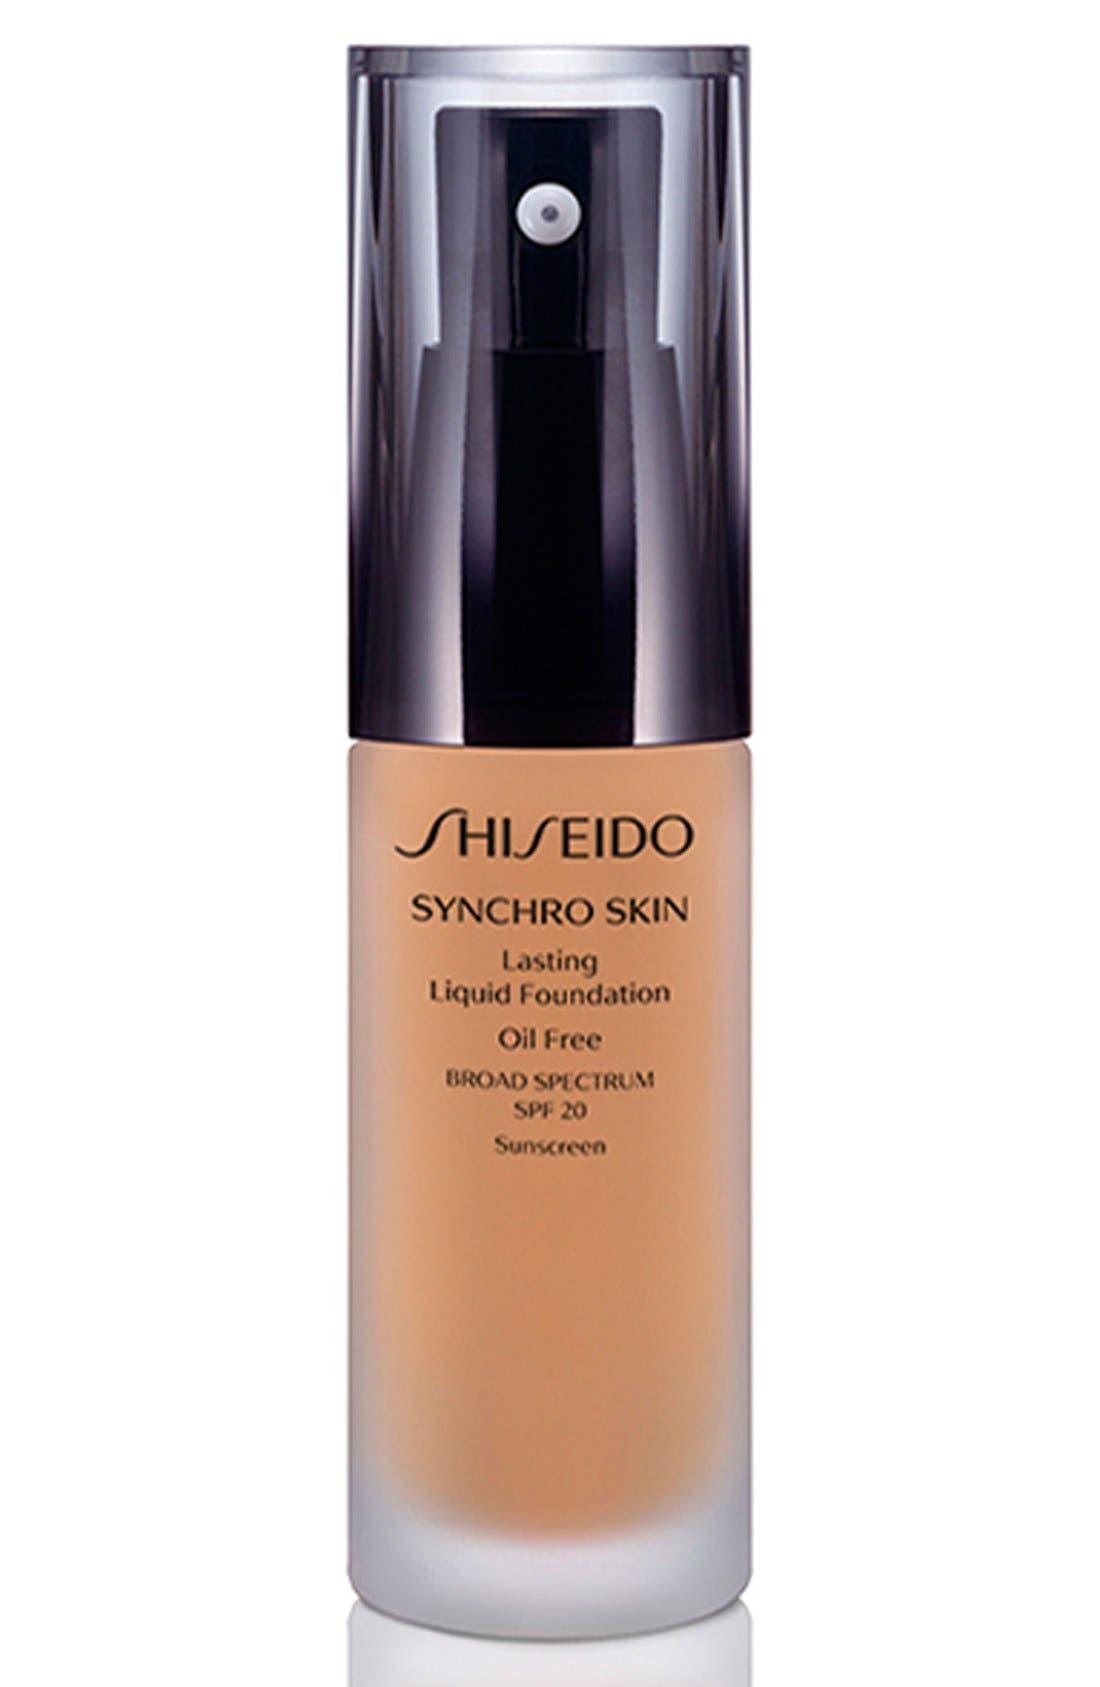 Shiseido 'Synchro Skin' Lasting Liquid Foundation Broad Spectrum SPF 20